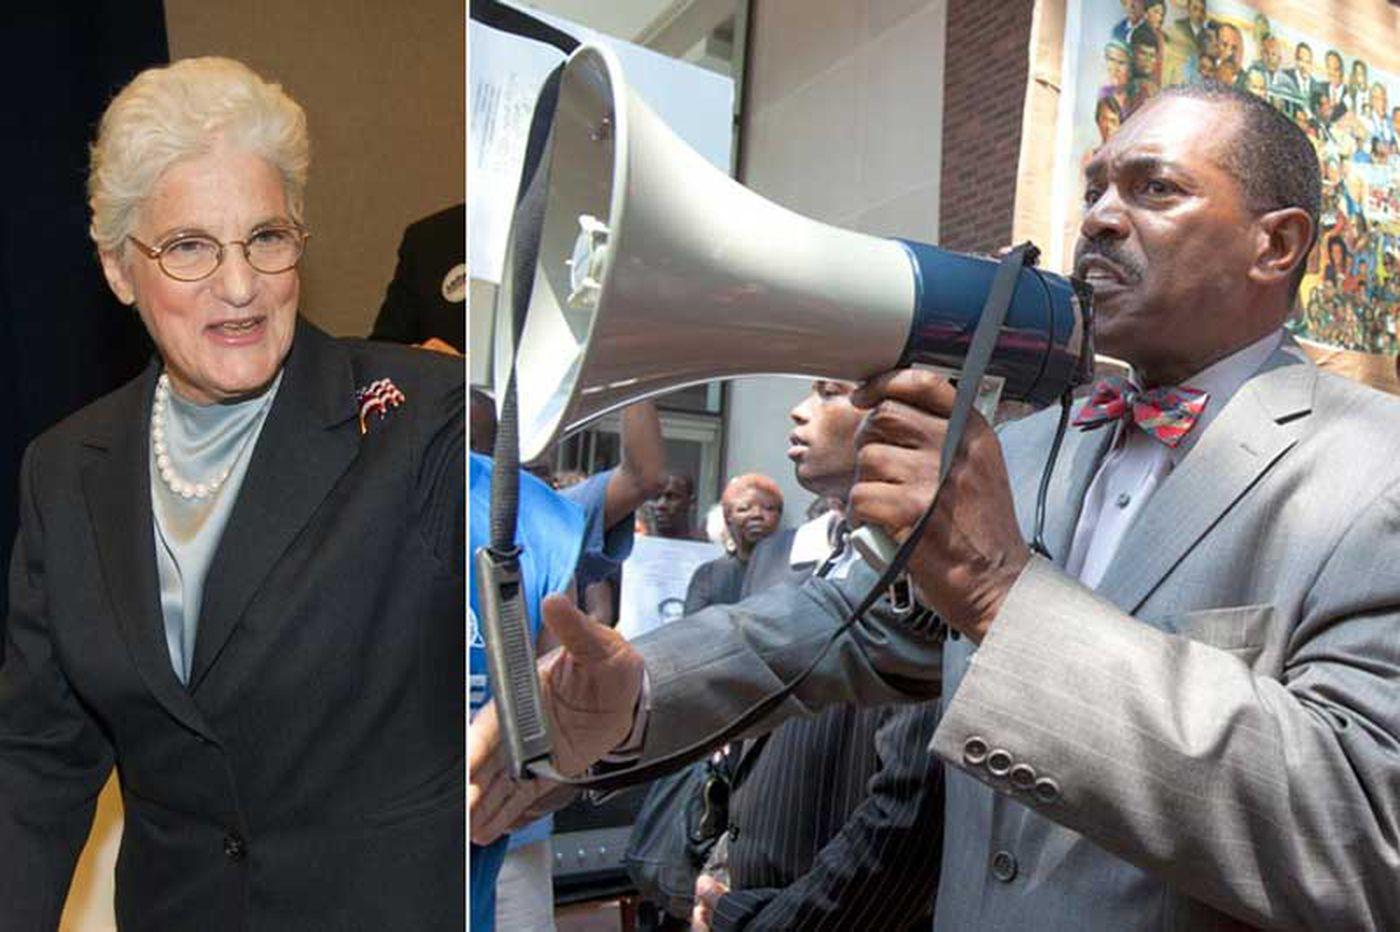 Interim DA candidate Abraham fires back at NAACP head